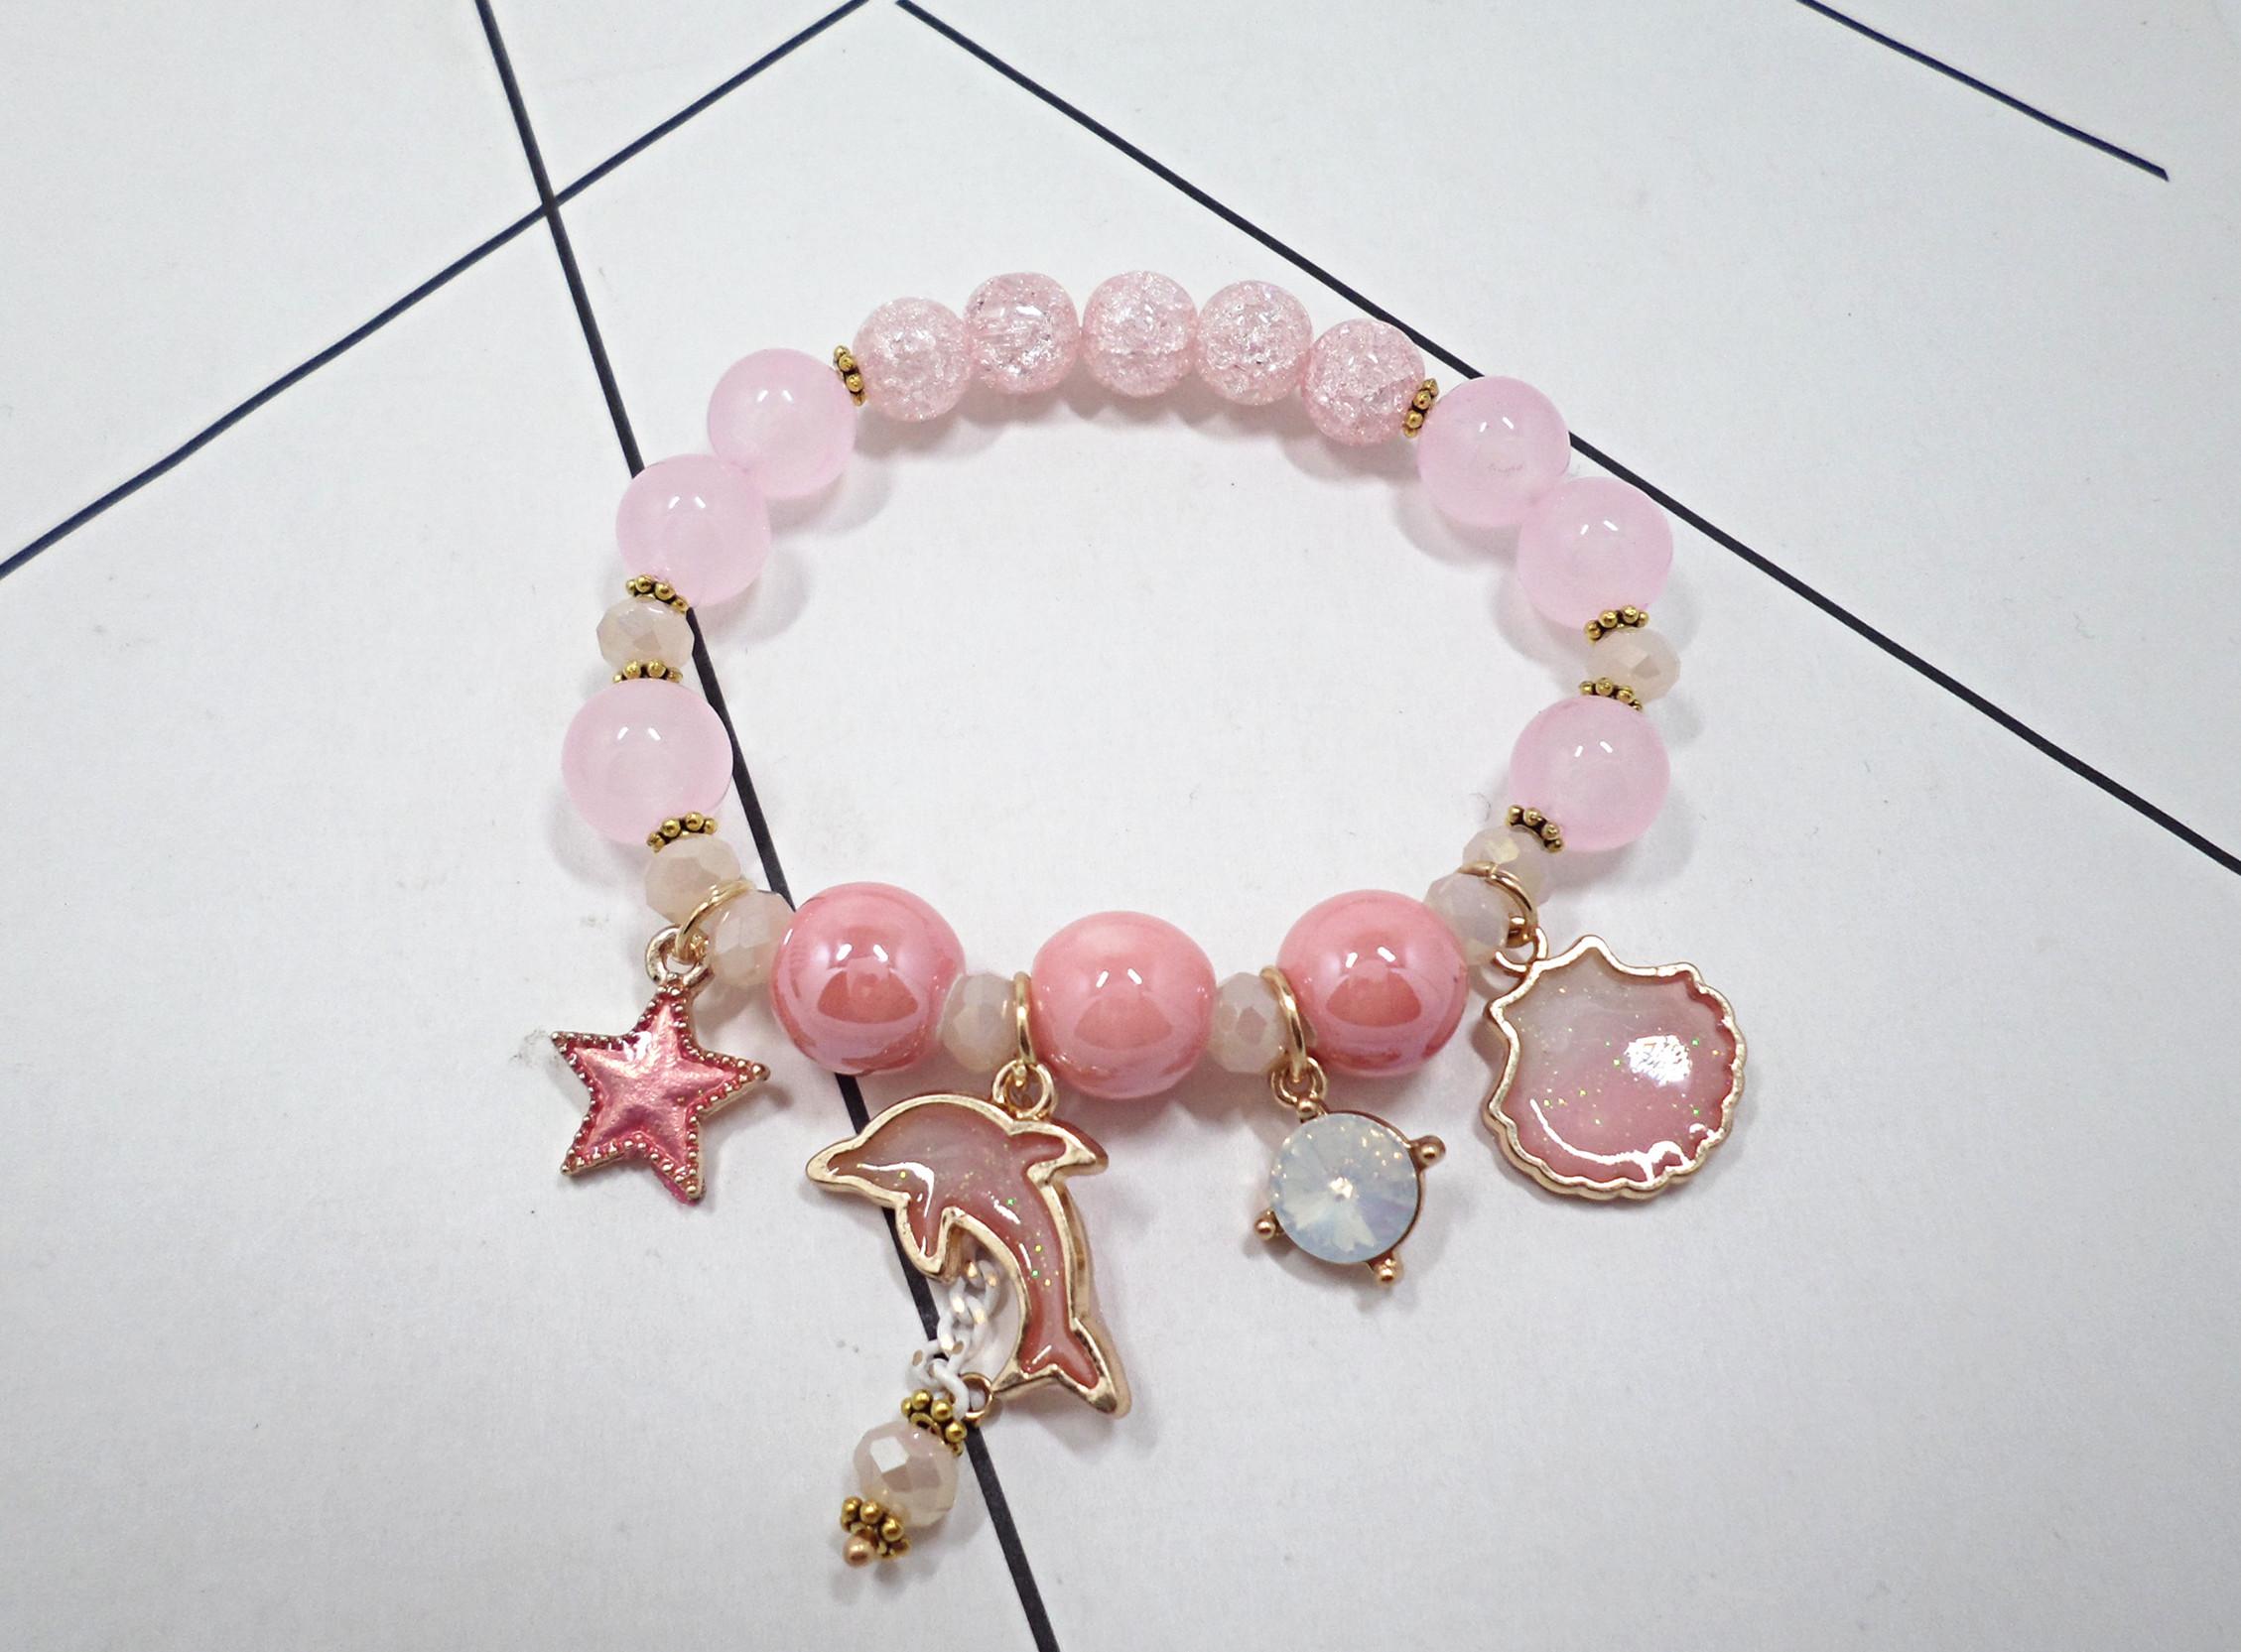 Wholesale Korean Sweet Marine Dolphin Shell Flower Charm Bracelet Crystal Beads Bracelets for Women Beach Holiday Fashion Jewelry VGB100 0